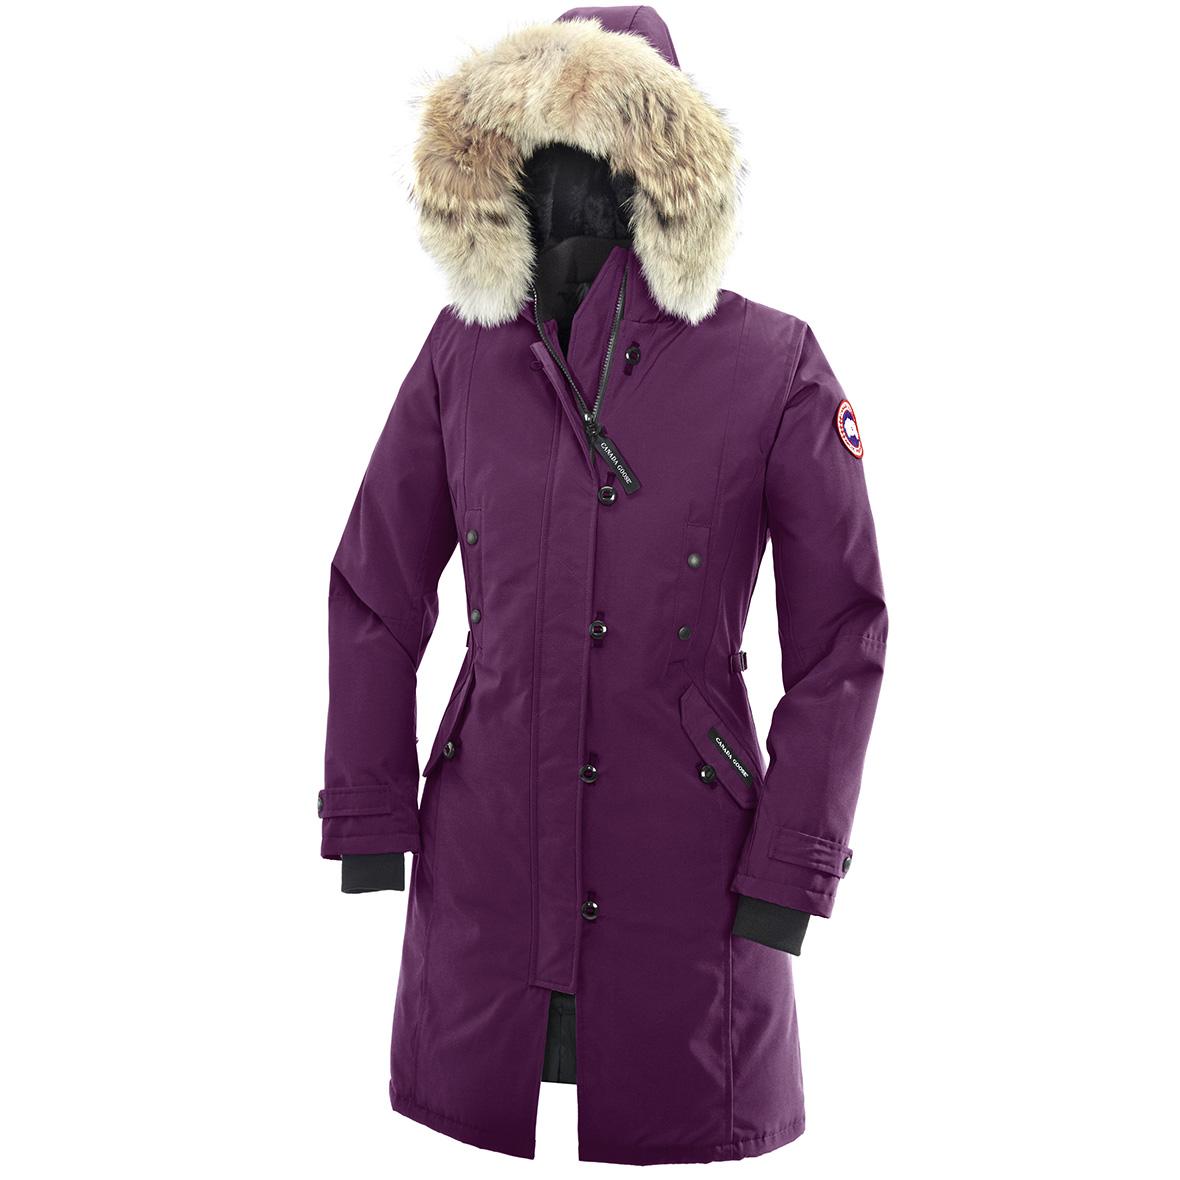 2b52193edae3 Canada Goose Kensington Parka ARCTIC DUSK For Women